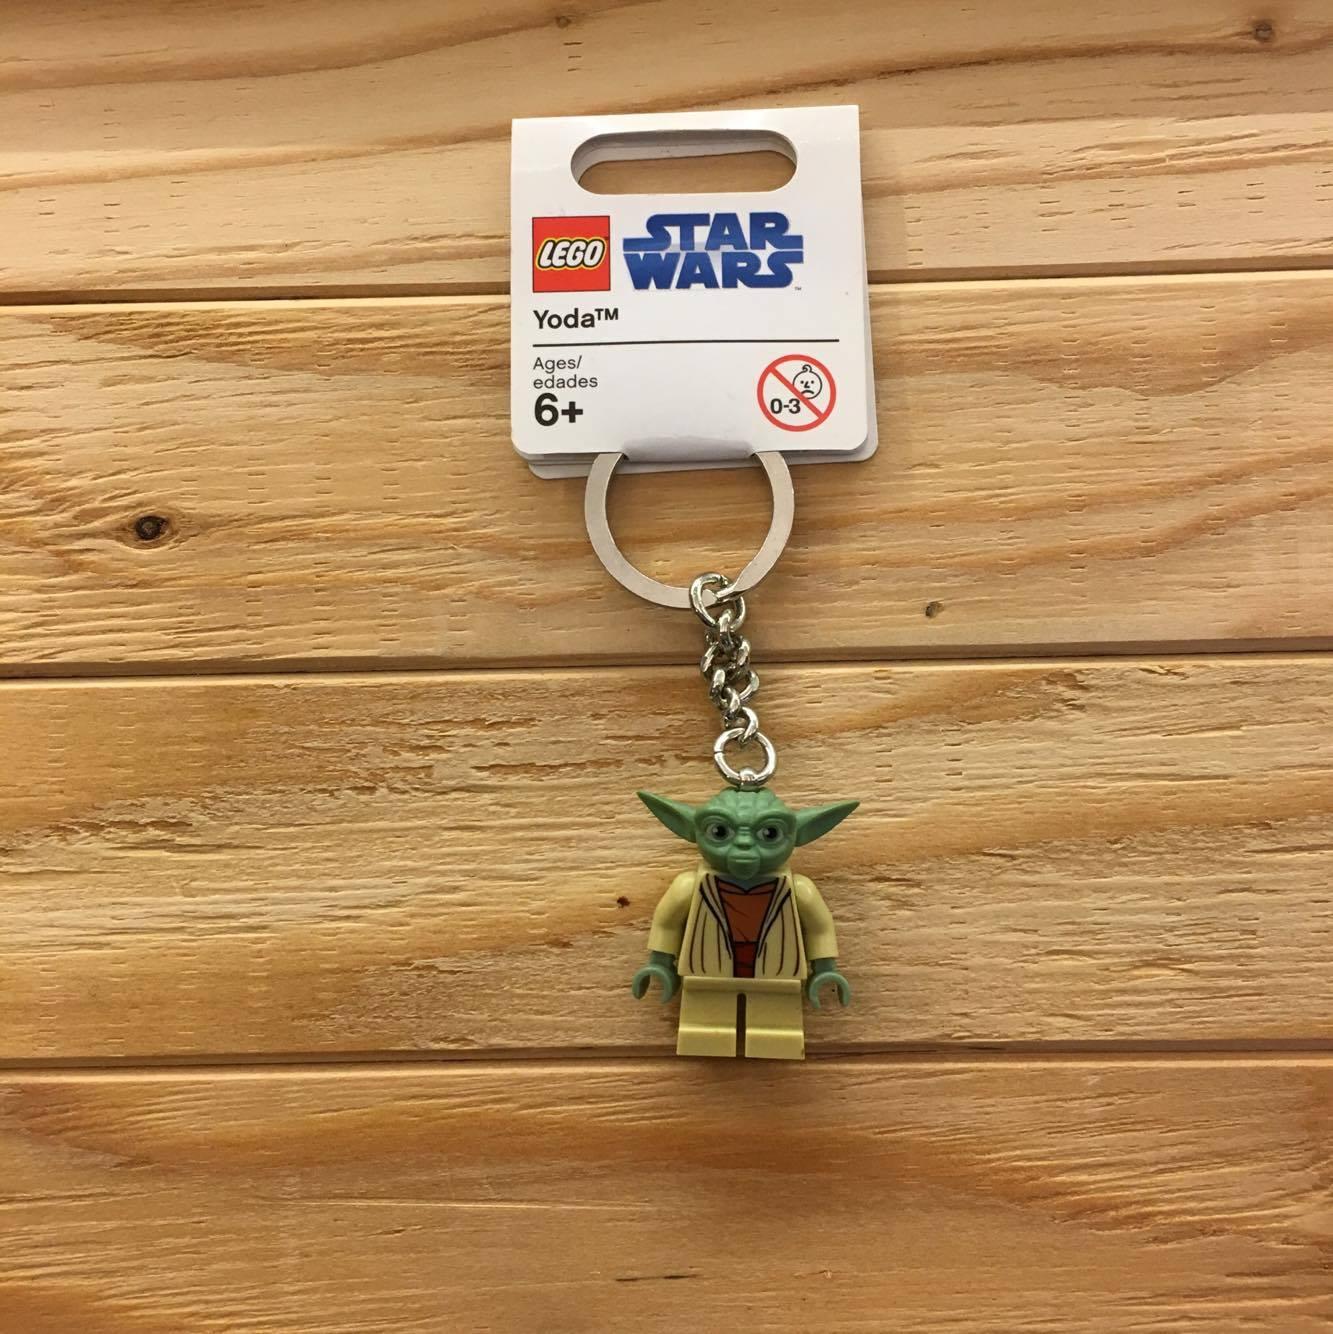 BEETLE PLUS 全新 現貨 環球影城 LEGO 樂高 星際大戰 STAR WARS 絕地武士 YODA 鑰匙圈